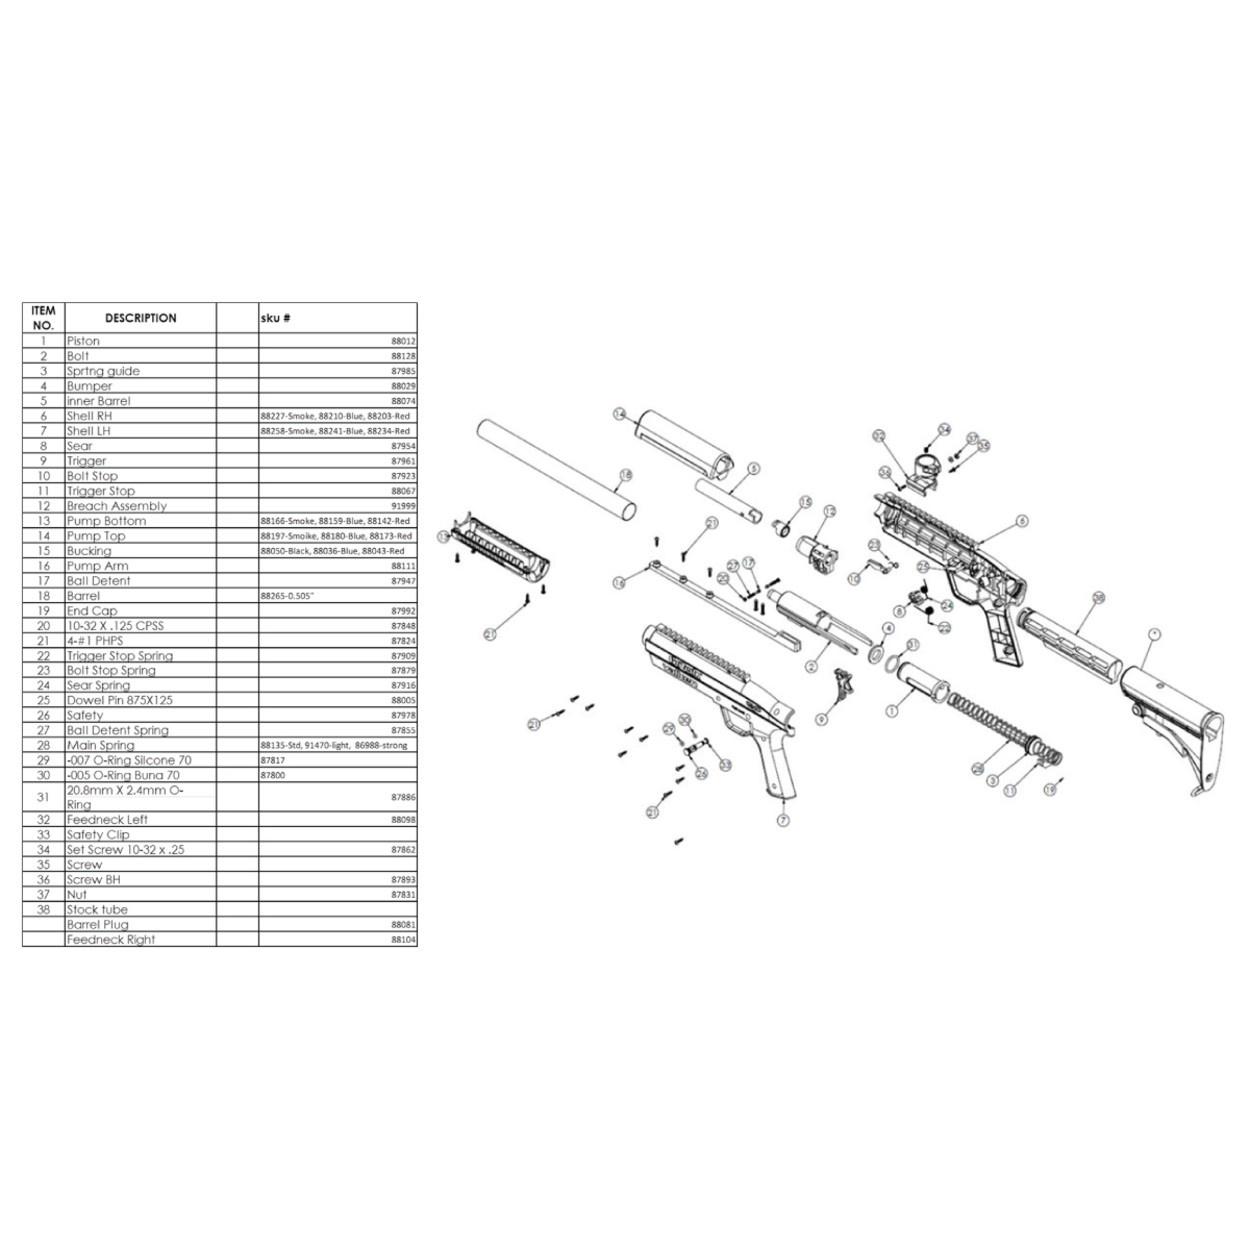 Valken Gotcha Paintball Kidz Shotgun - various spare parts